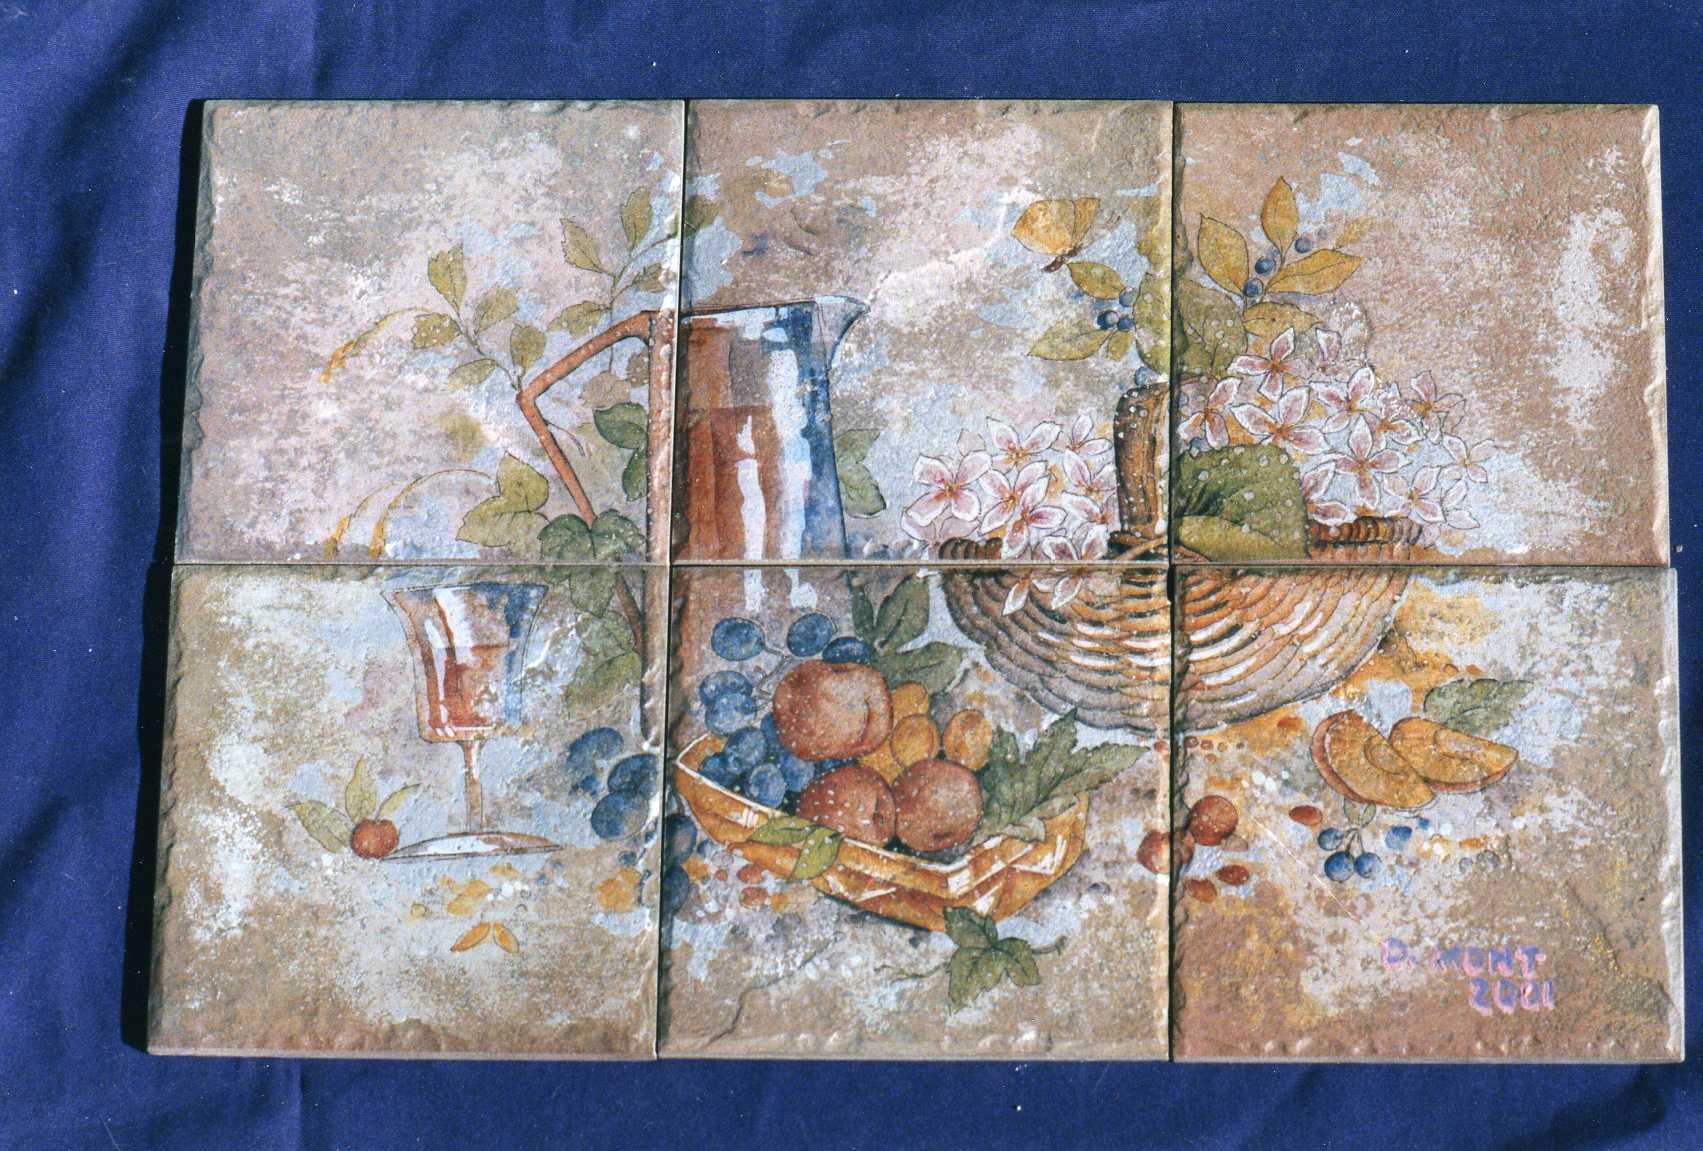 Outdoor ceramic tile murals